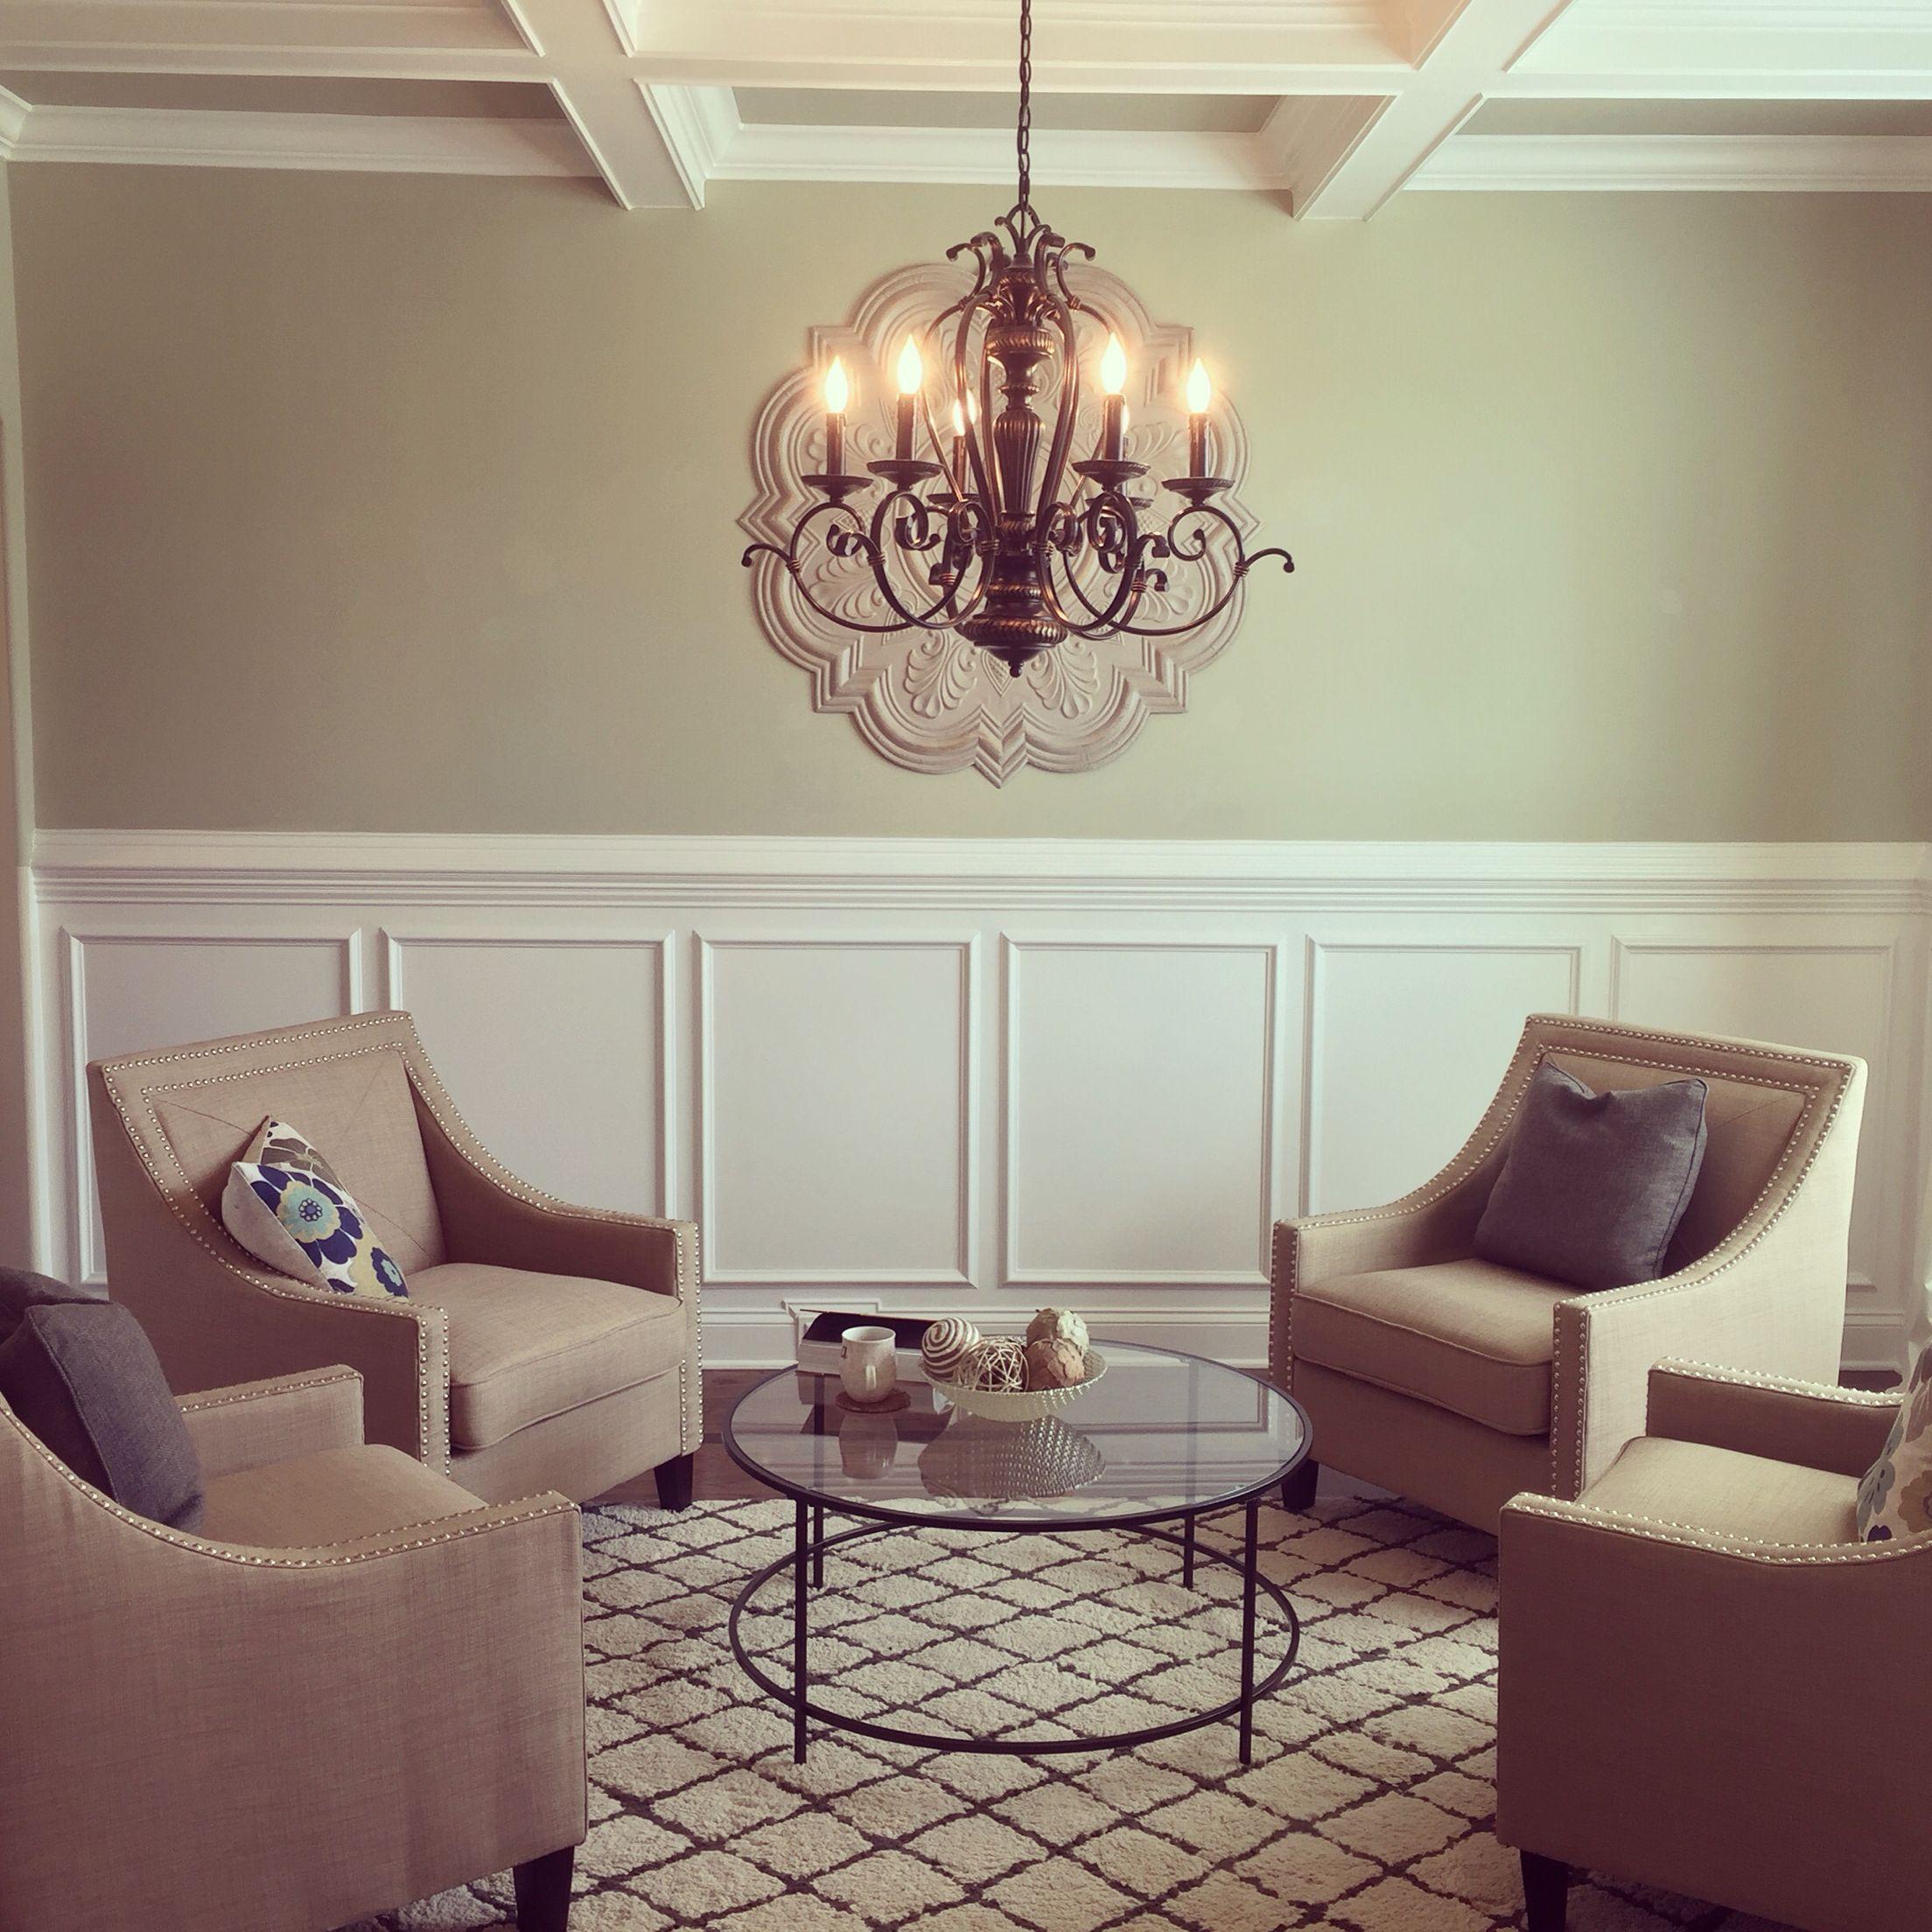 30 inspired image of dining room alternatives dining - Alternative uses for formal living room ...